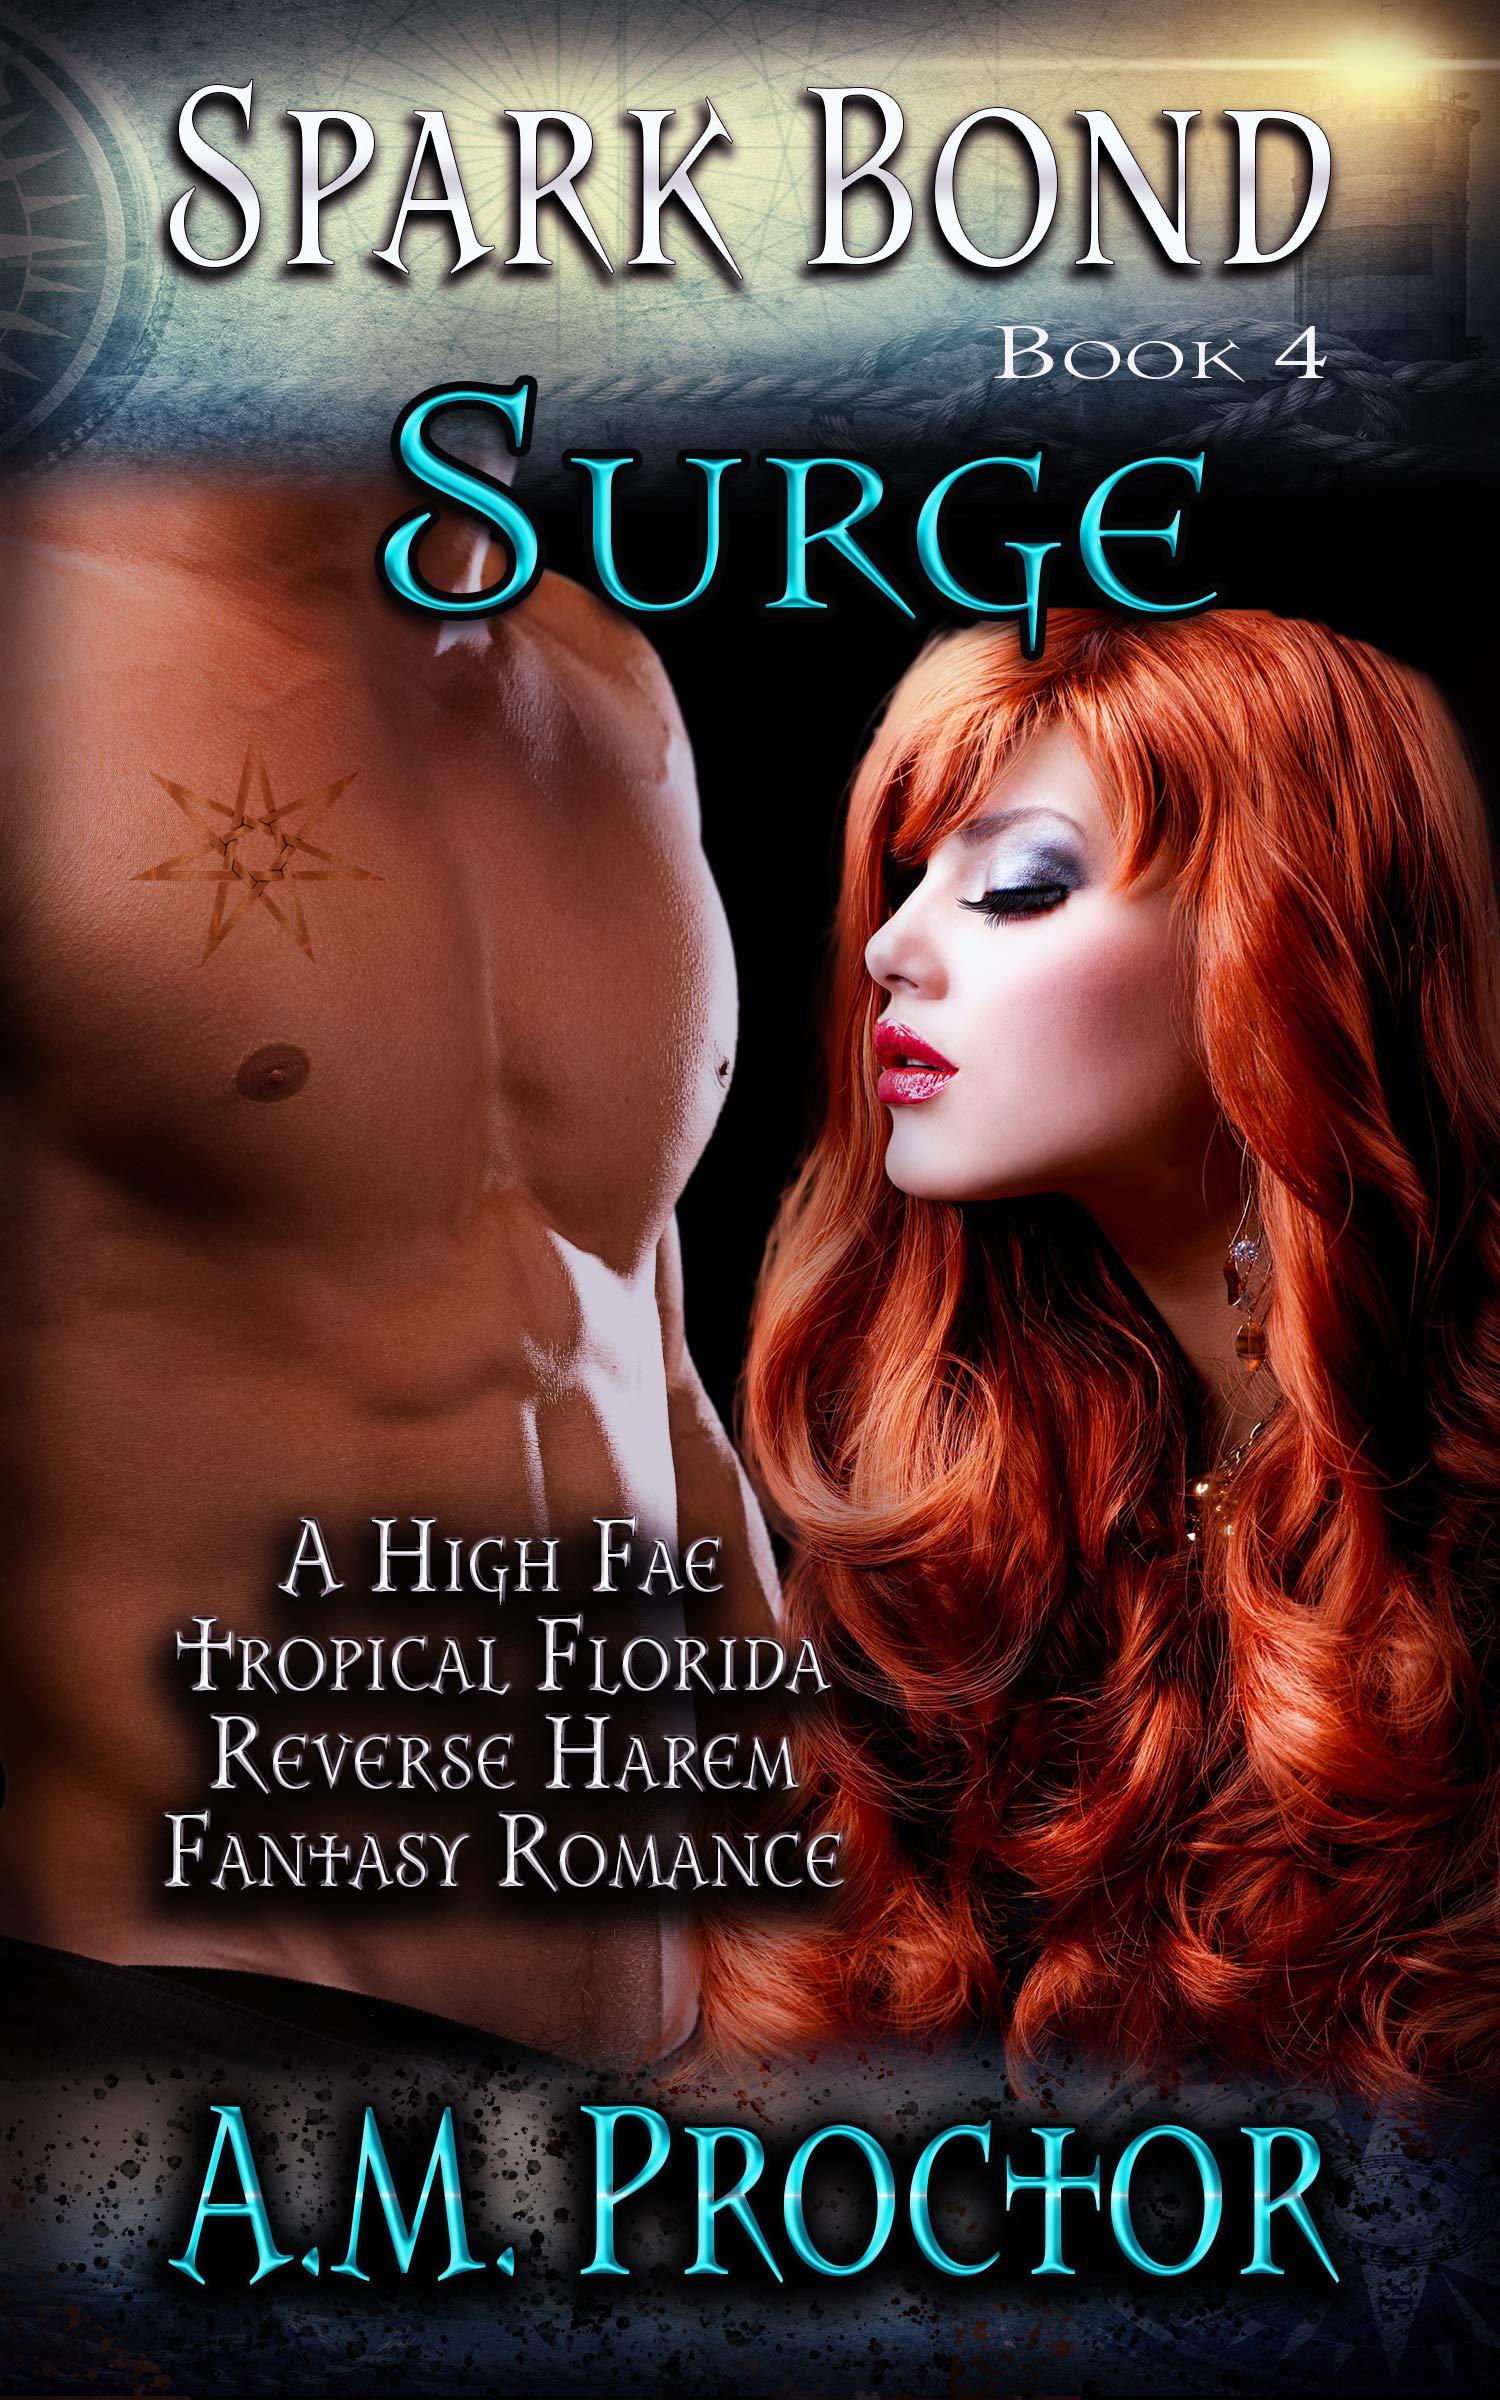 Spark Bond Surge: A Tropical, High Fae, Fantasy Romance